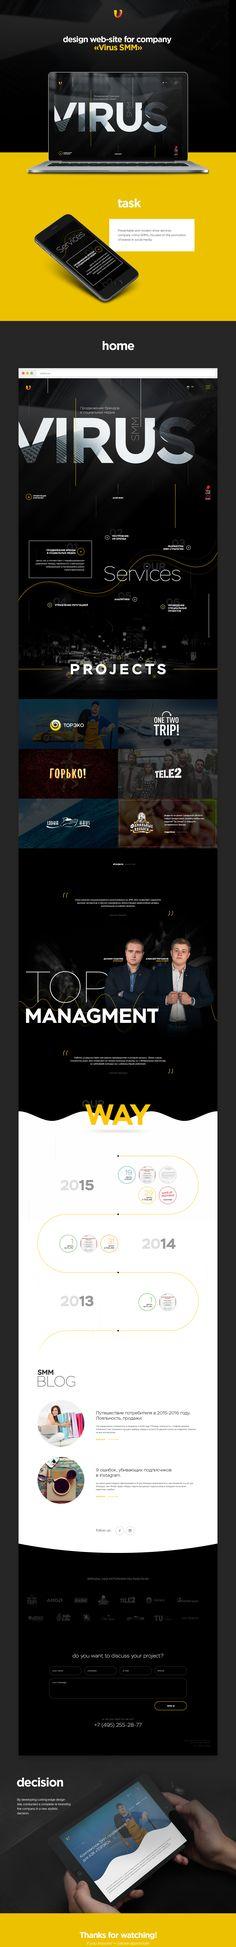 Design web-site for company «Virus SMM